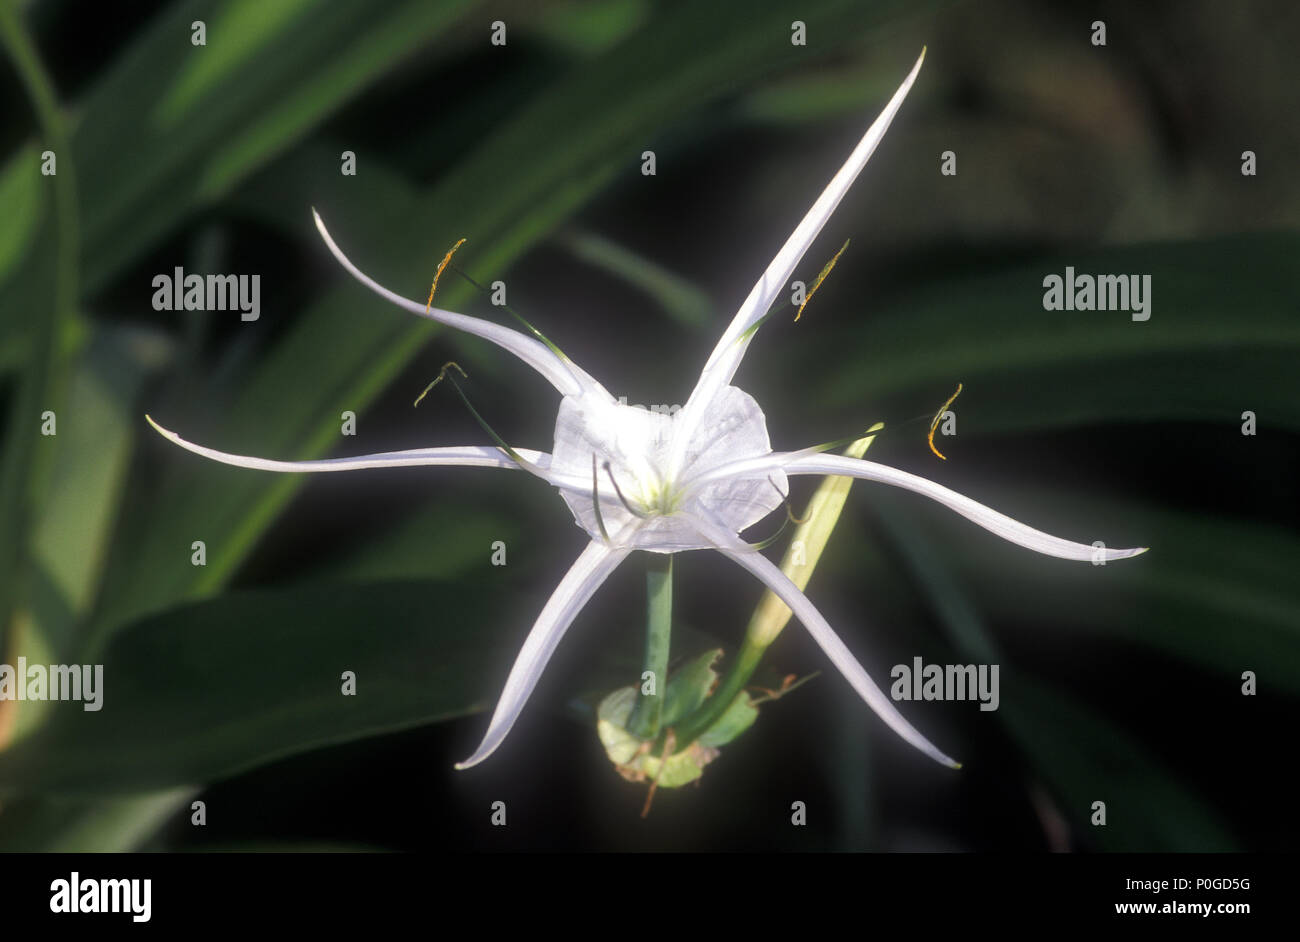 Hymenocallis littoralis common names spider flowers ismene hymenocallis littoralis common names spider flowers ismene spider lily filmy lily or basket flower izmirmasajfo